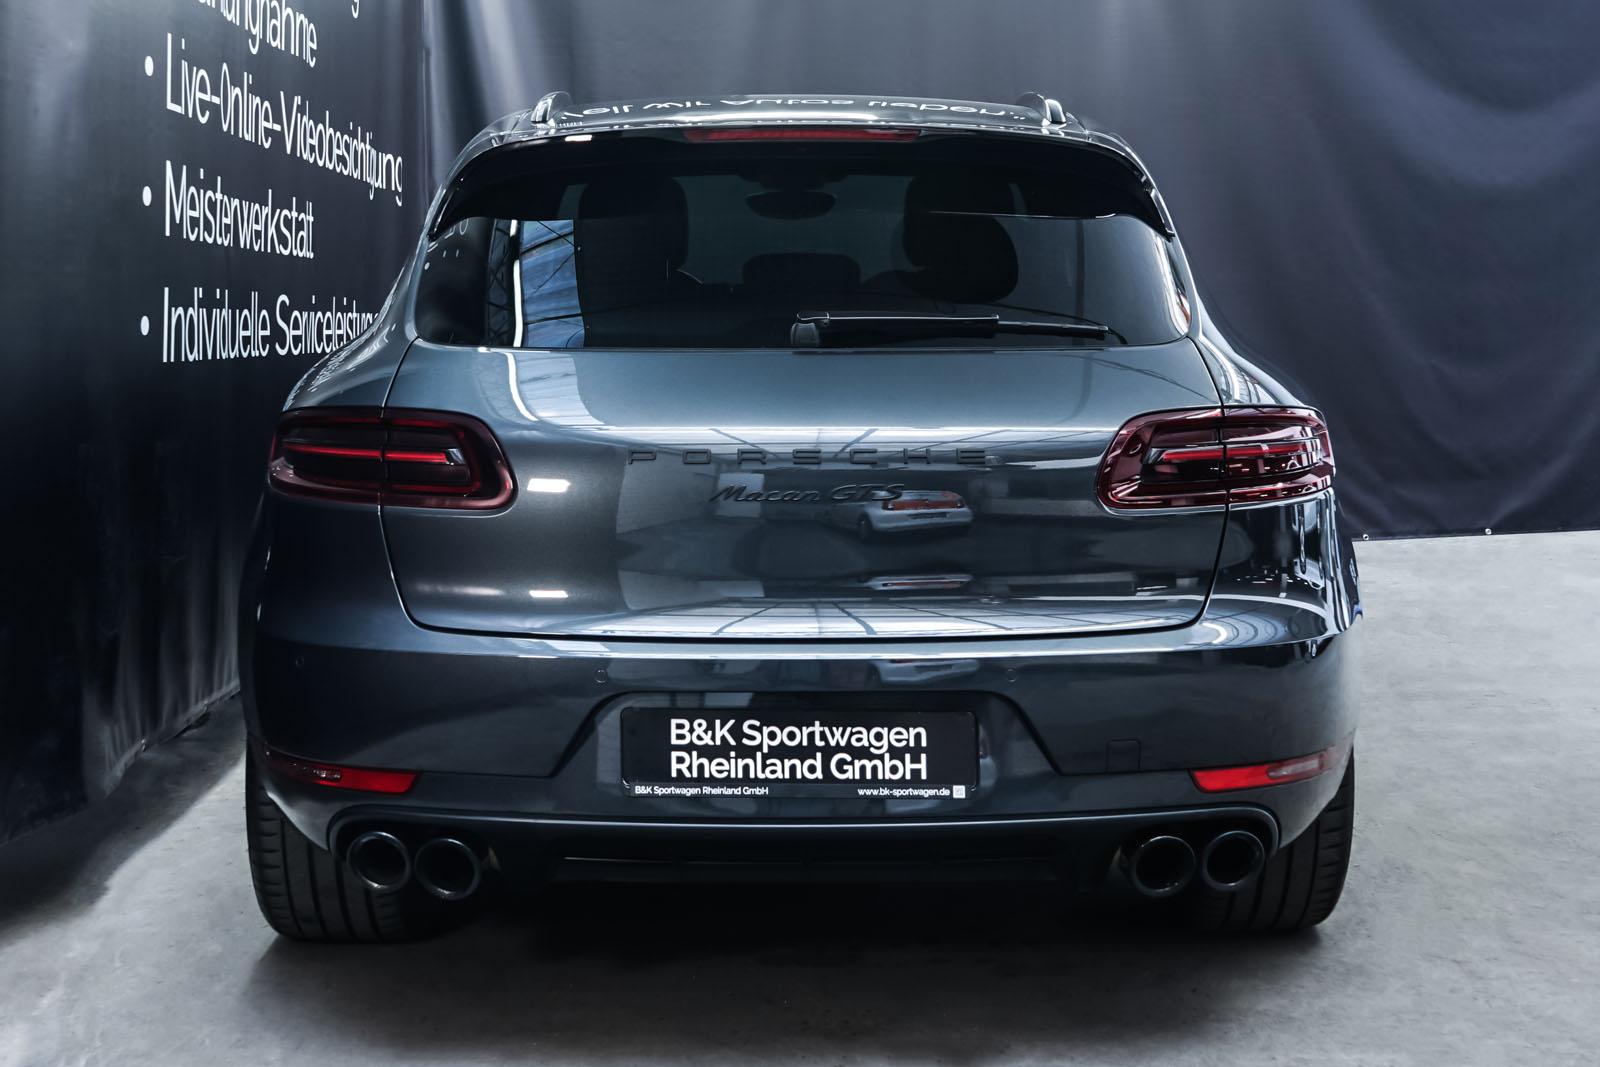 Porsche_Macan_GTS_Dunkelgrau_Schwarz_POR-8174_13_w